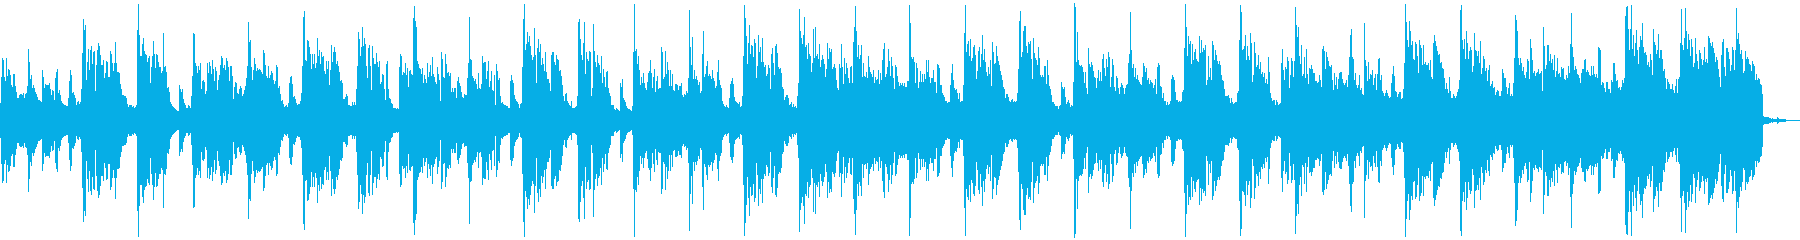 【CM】クールなエレクトロBGM・7の再生済みの波形